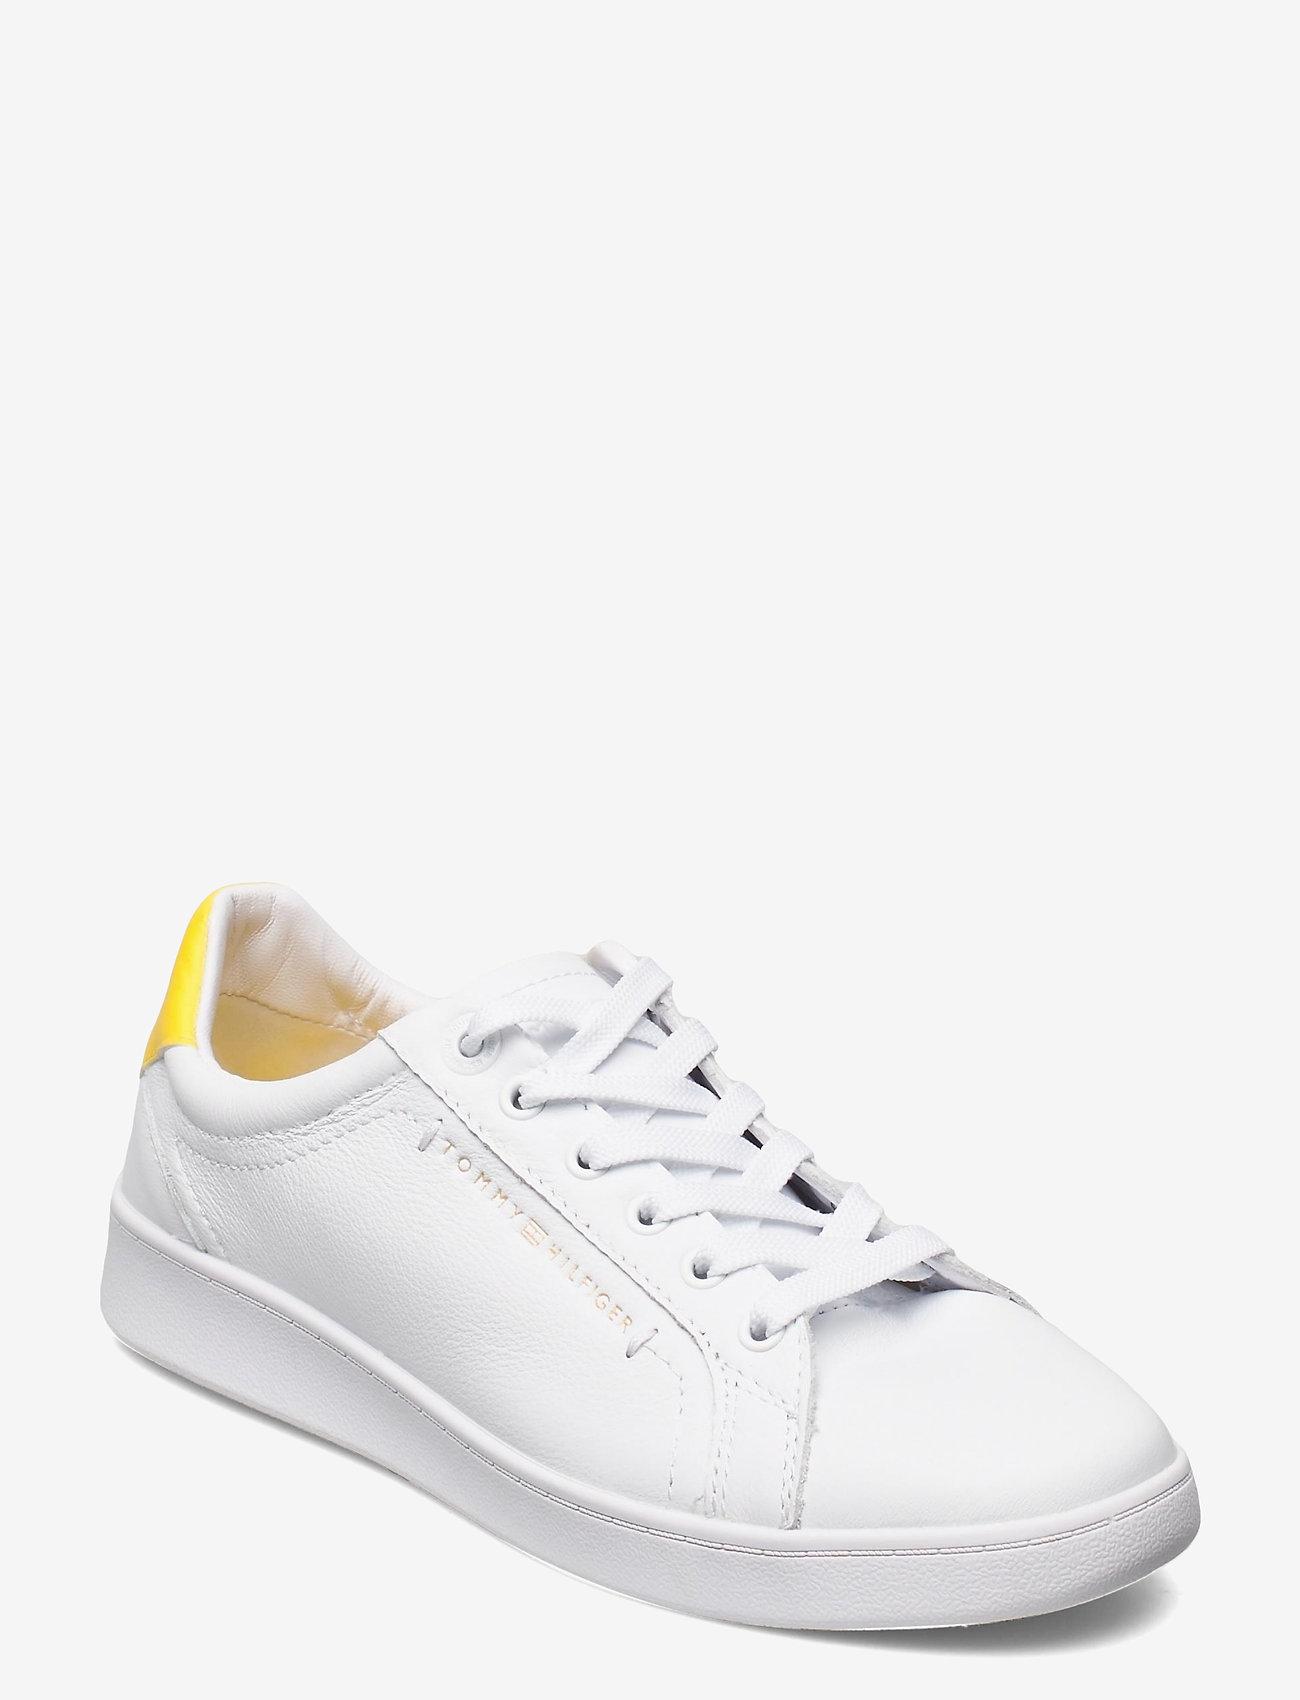 Tommy Hilfiger - PREMIUM COURT SNEAKER - low top sneakers - vivid yellow - 0